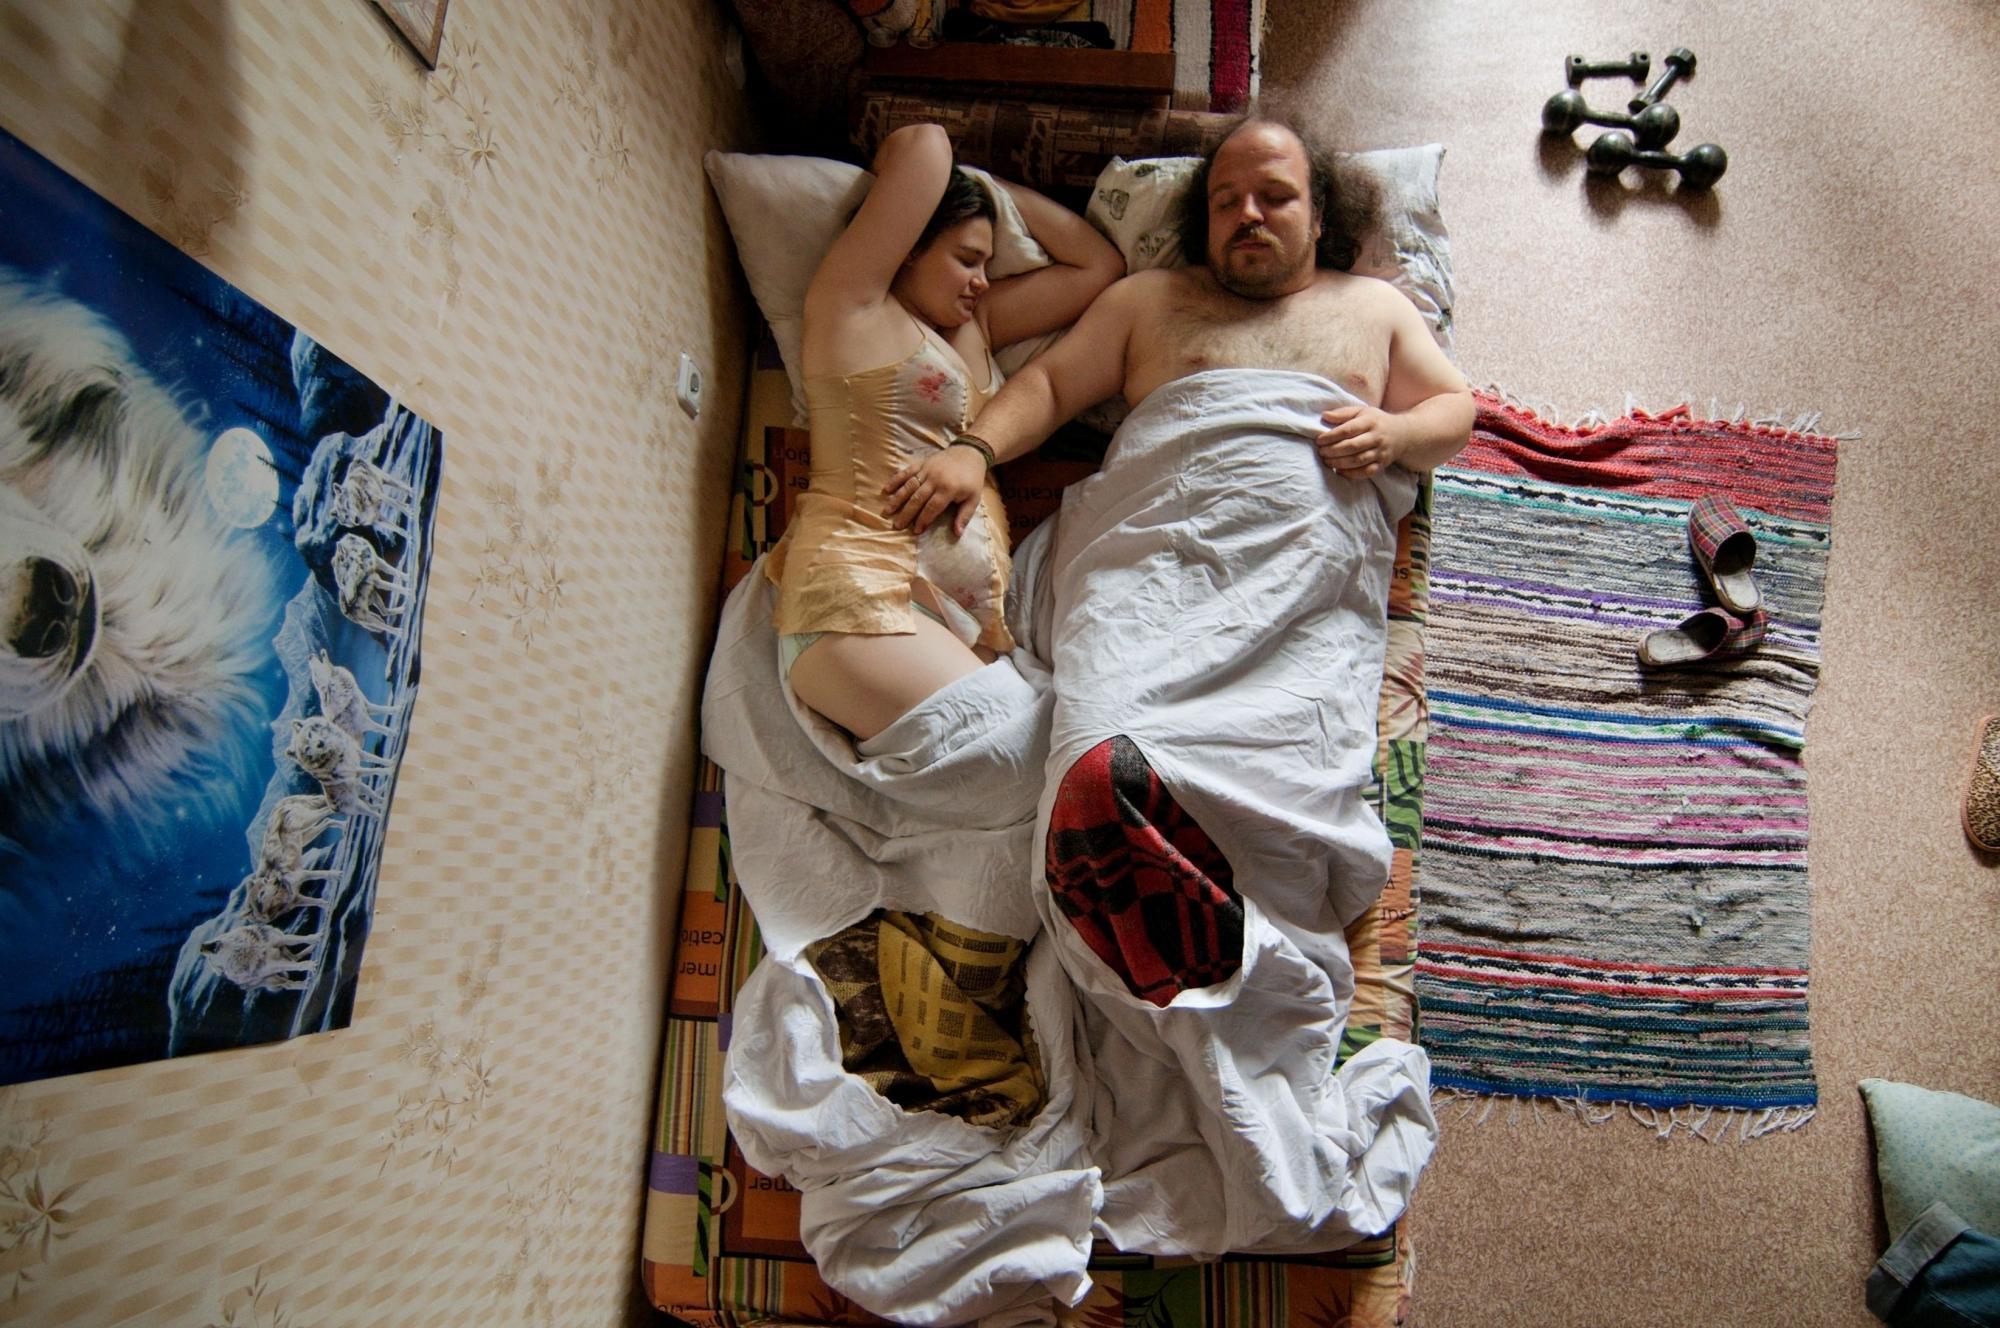 Фото домашнее супругов 24 фотография